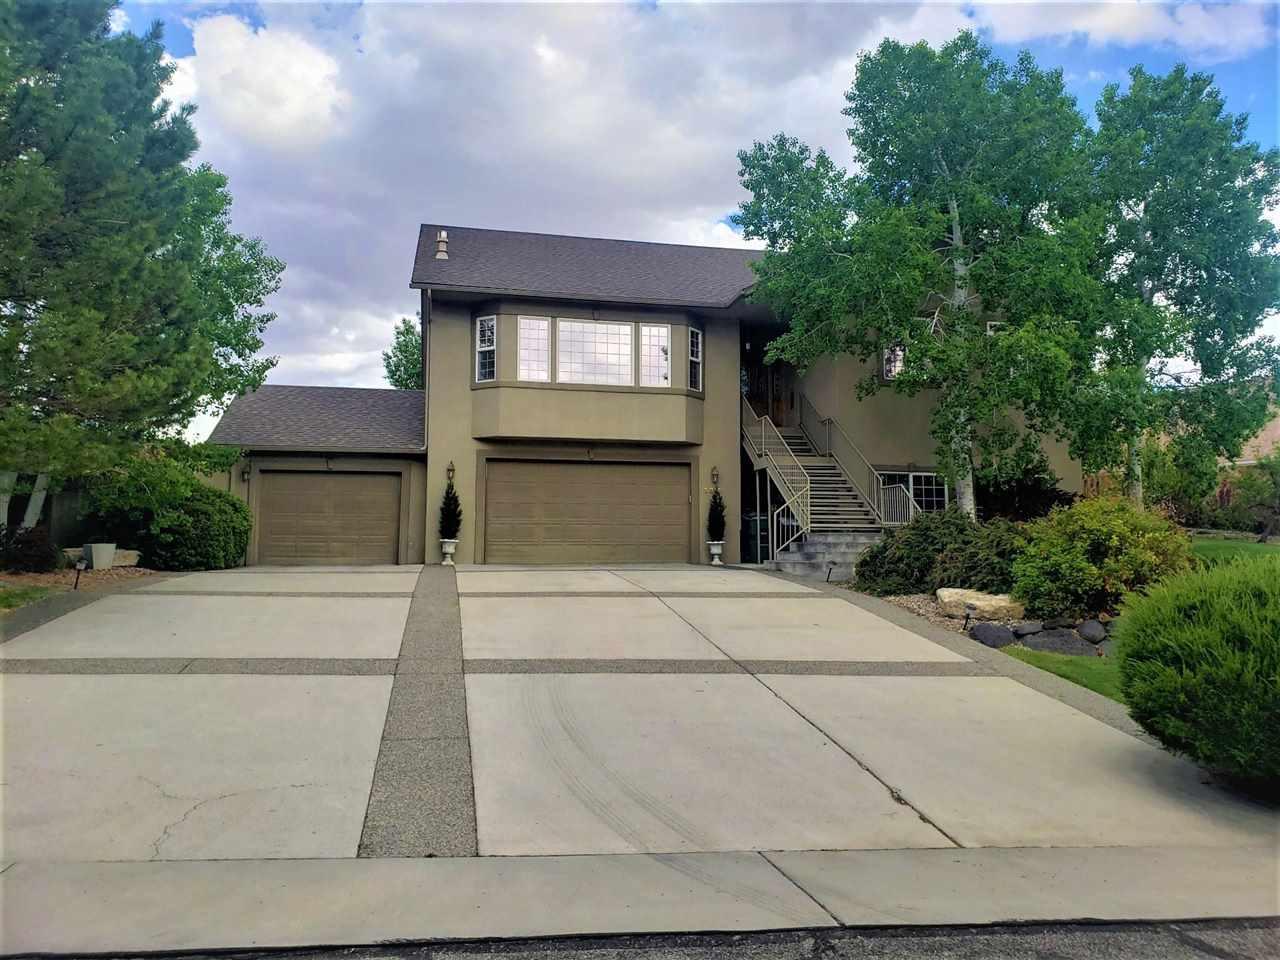 3810 Horizon Glen Court Property Photo - Grand Junction, CO real estate listing